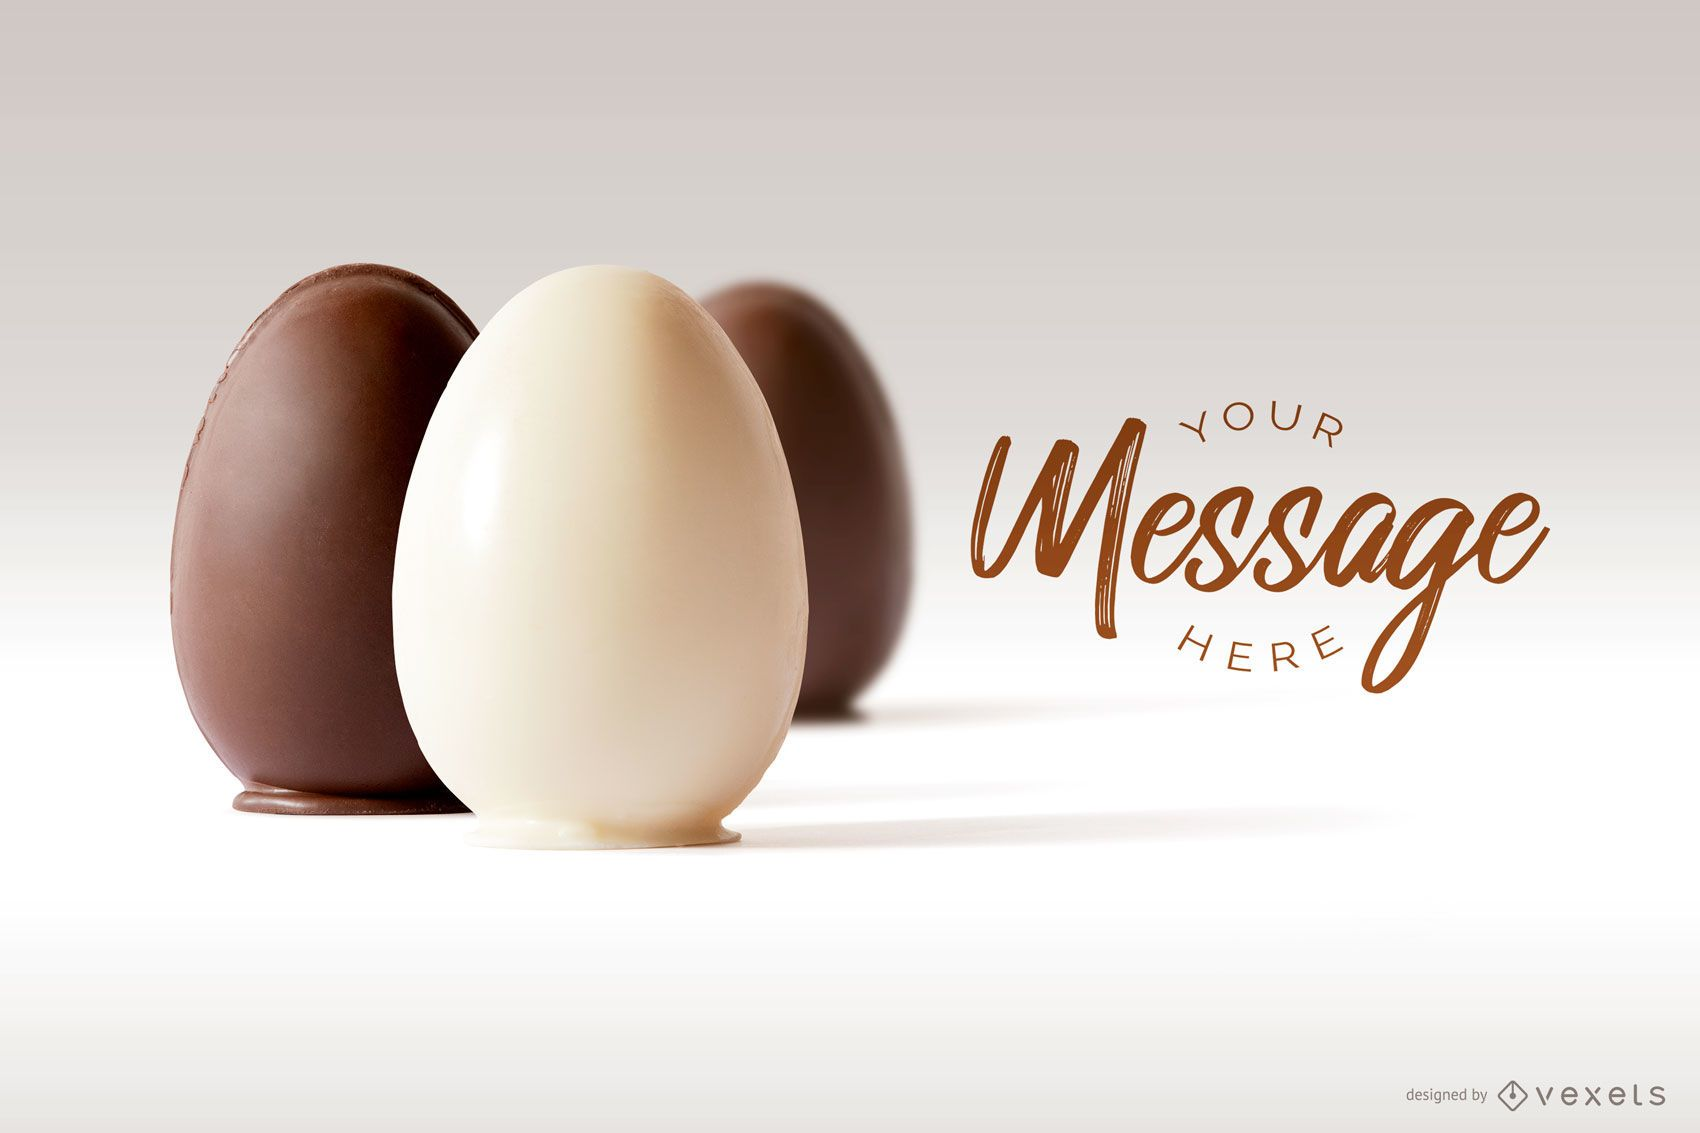 Chocolate Easter Eggs Image Mockup